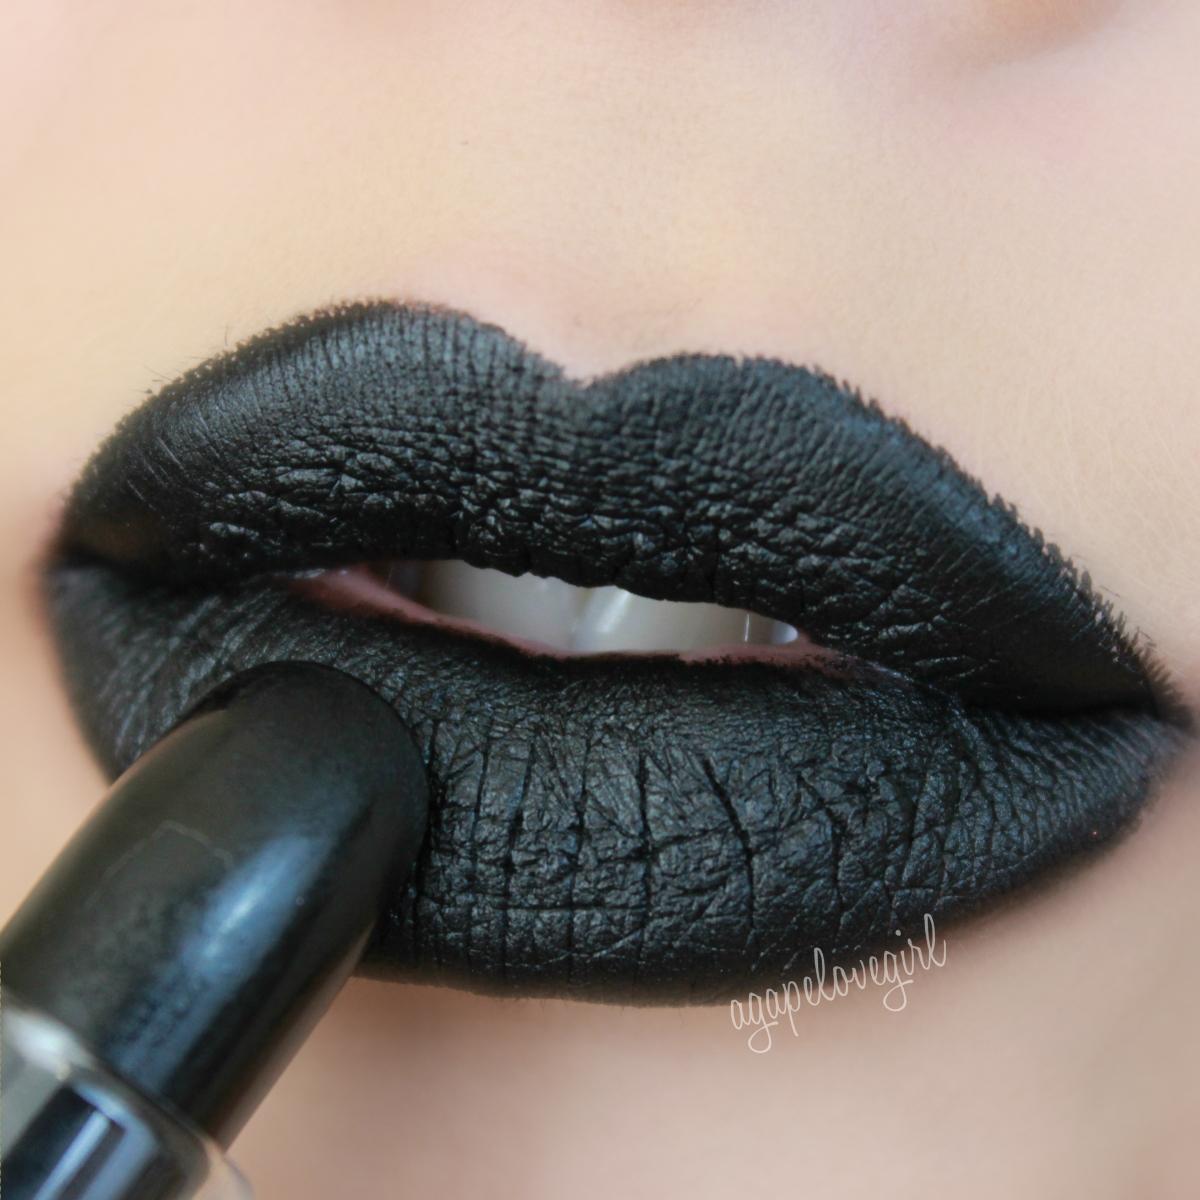 Agape Love Designs: MBA Cosmetics Luxury Matte Lipsticks